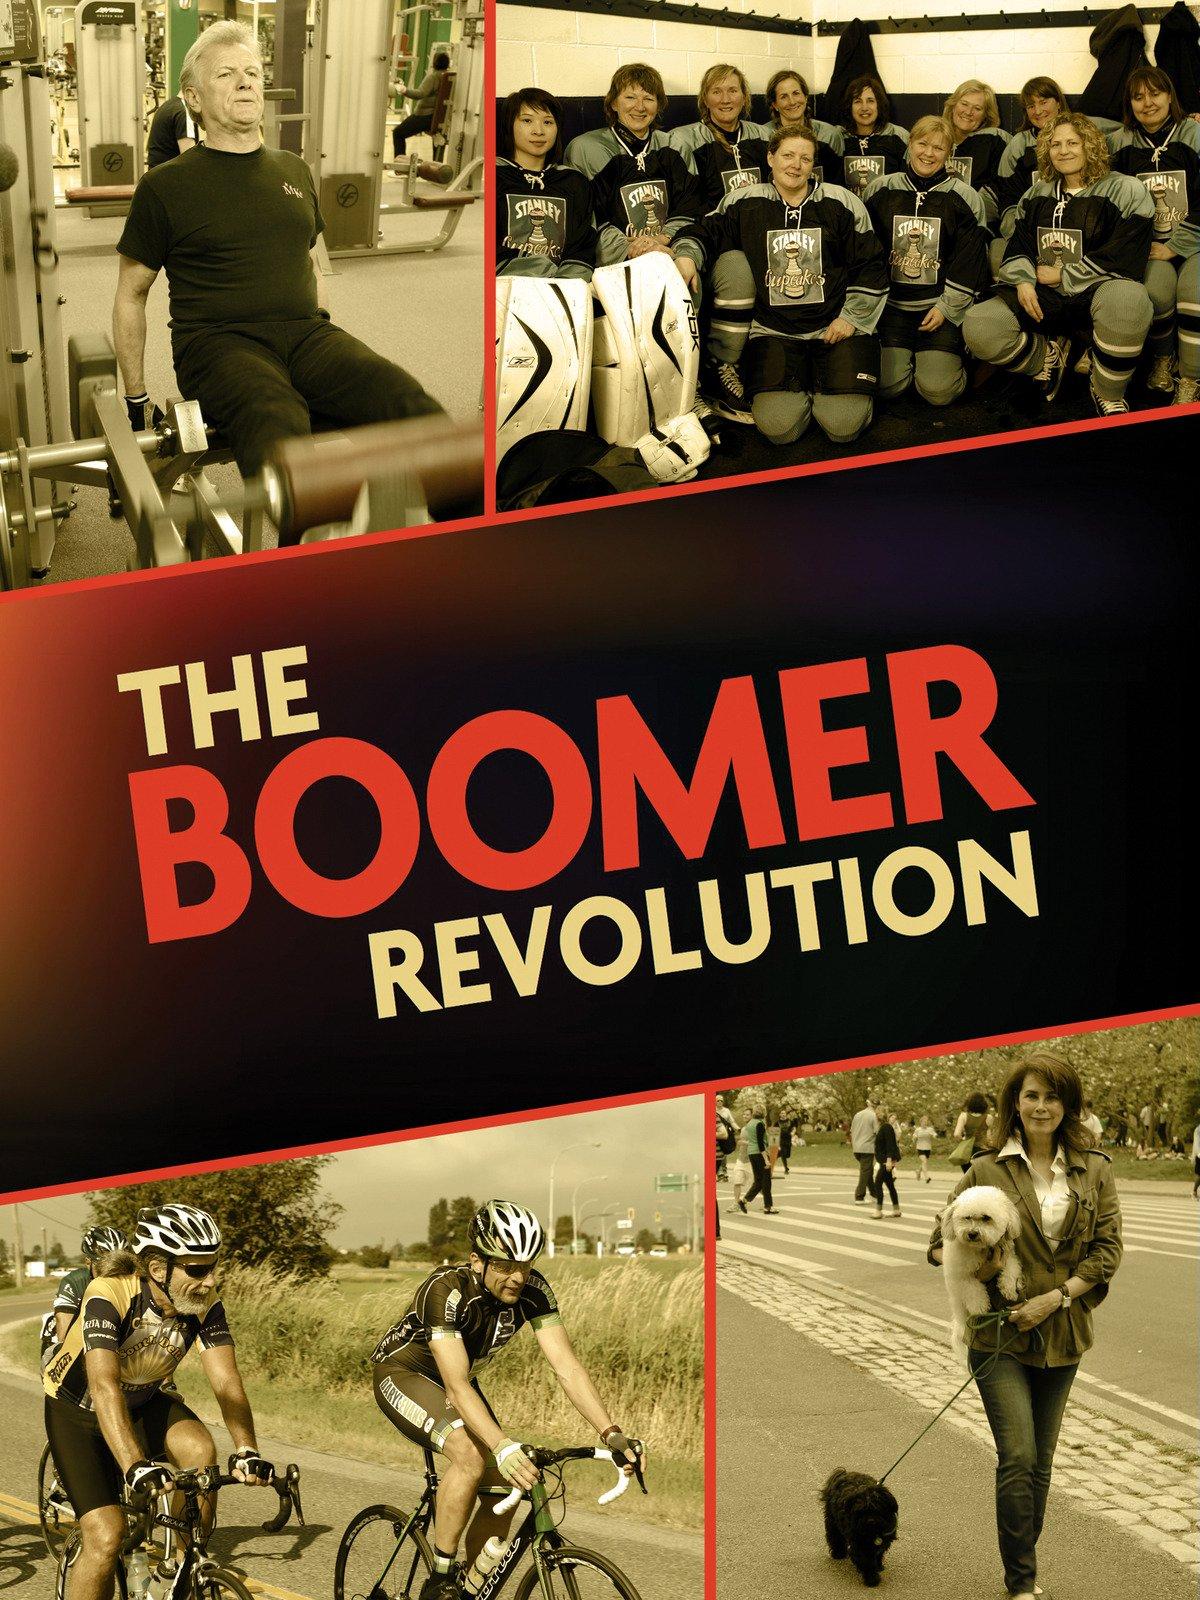 Boomer Revolution